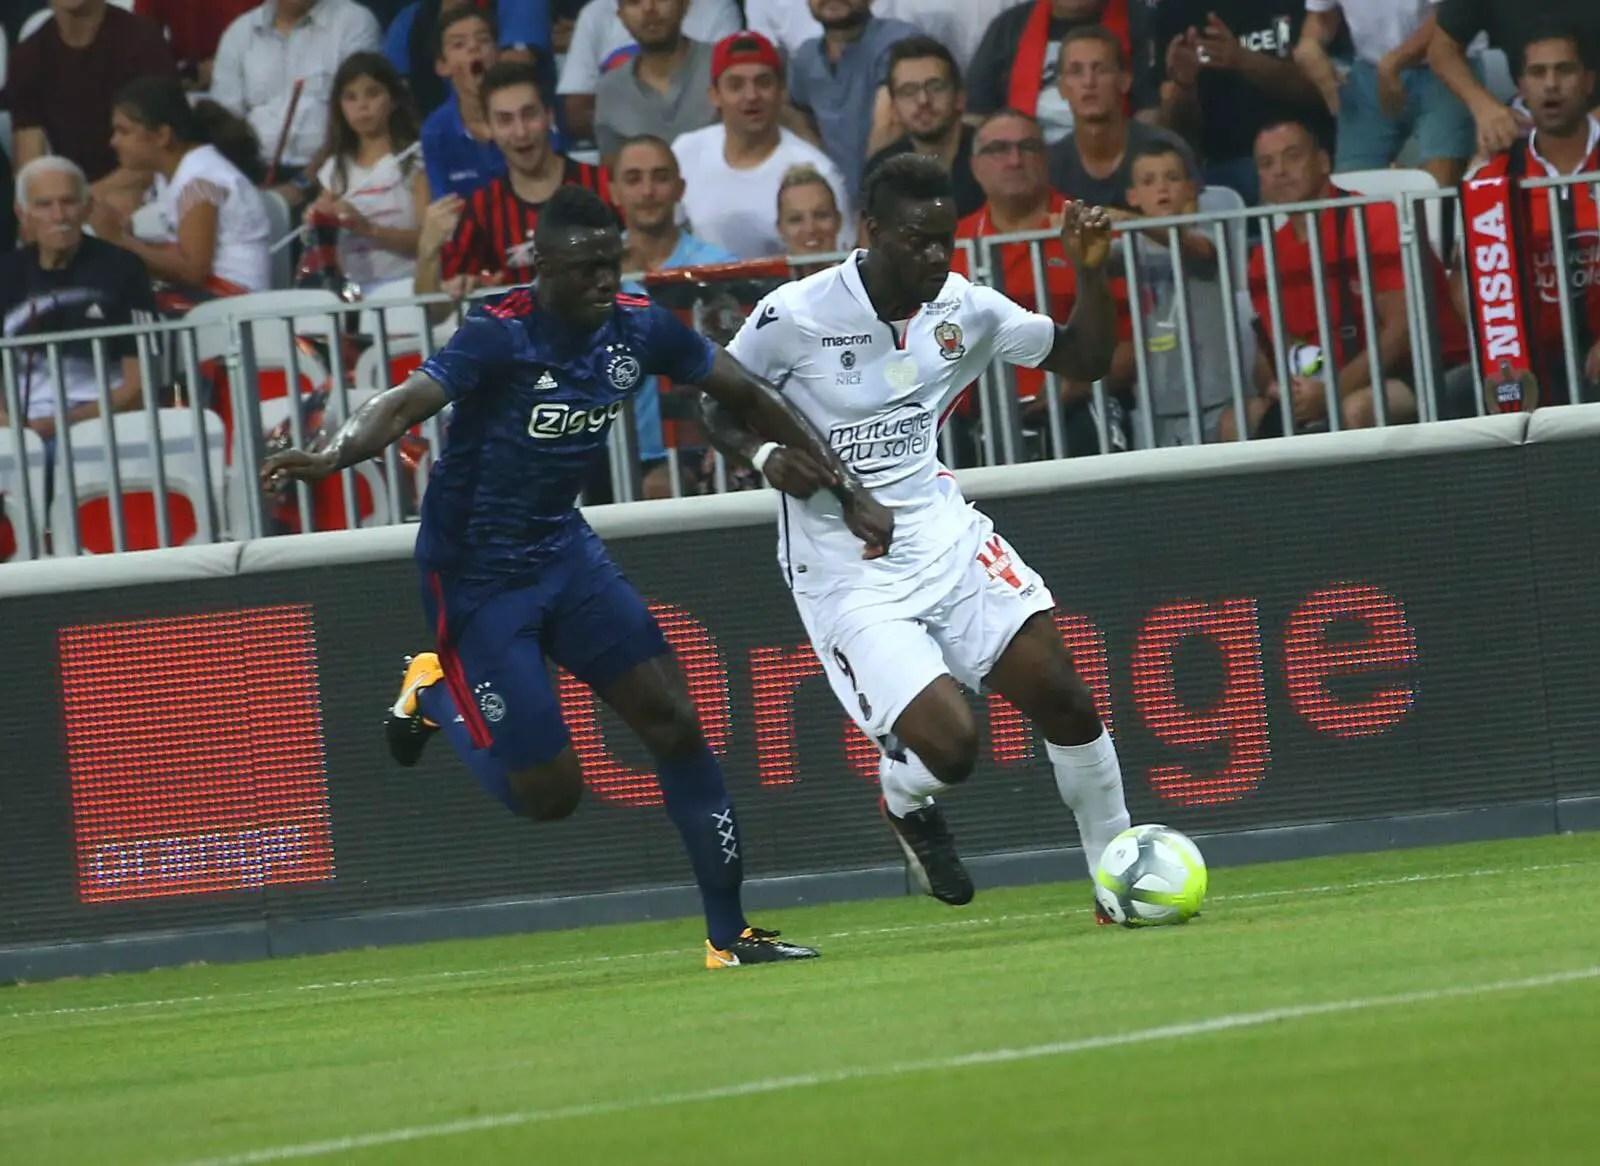 UCL: Balotelli Scores As Ajax Hold Nice; Adebayor Stars, Celtic Draw